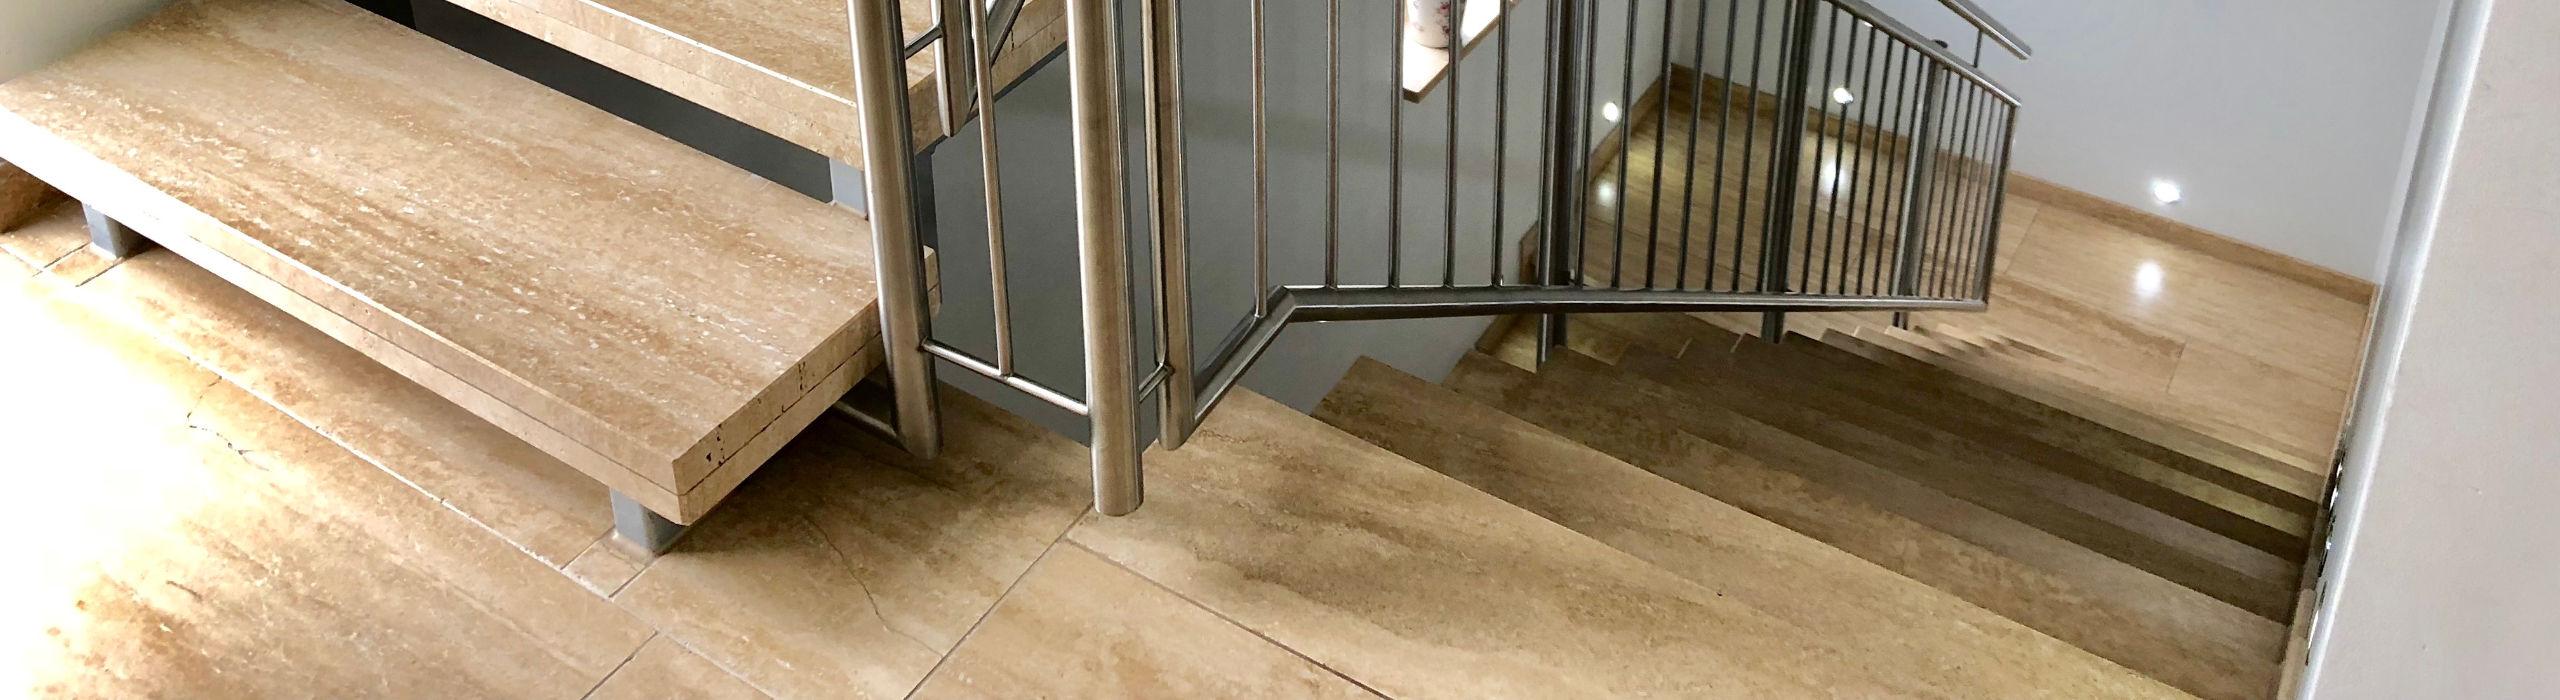 Treppe aus Travertin-Naturstein